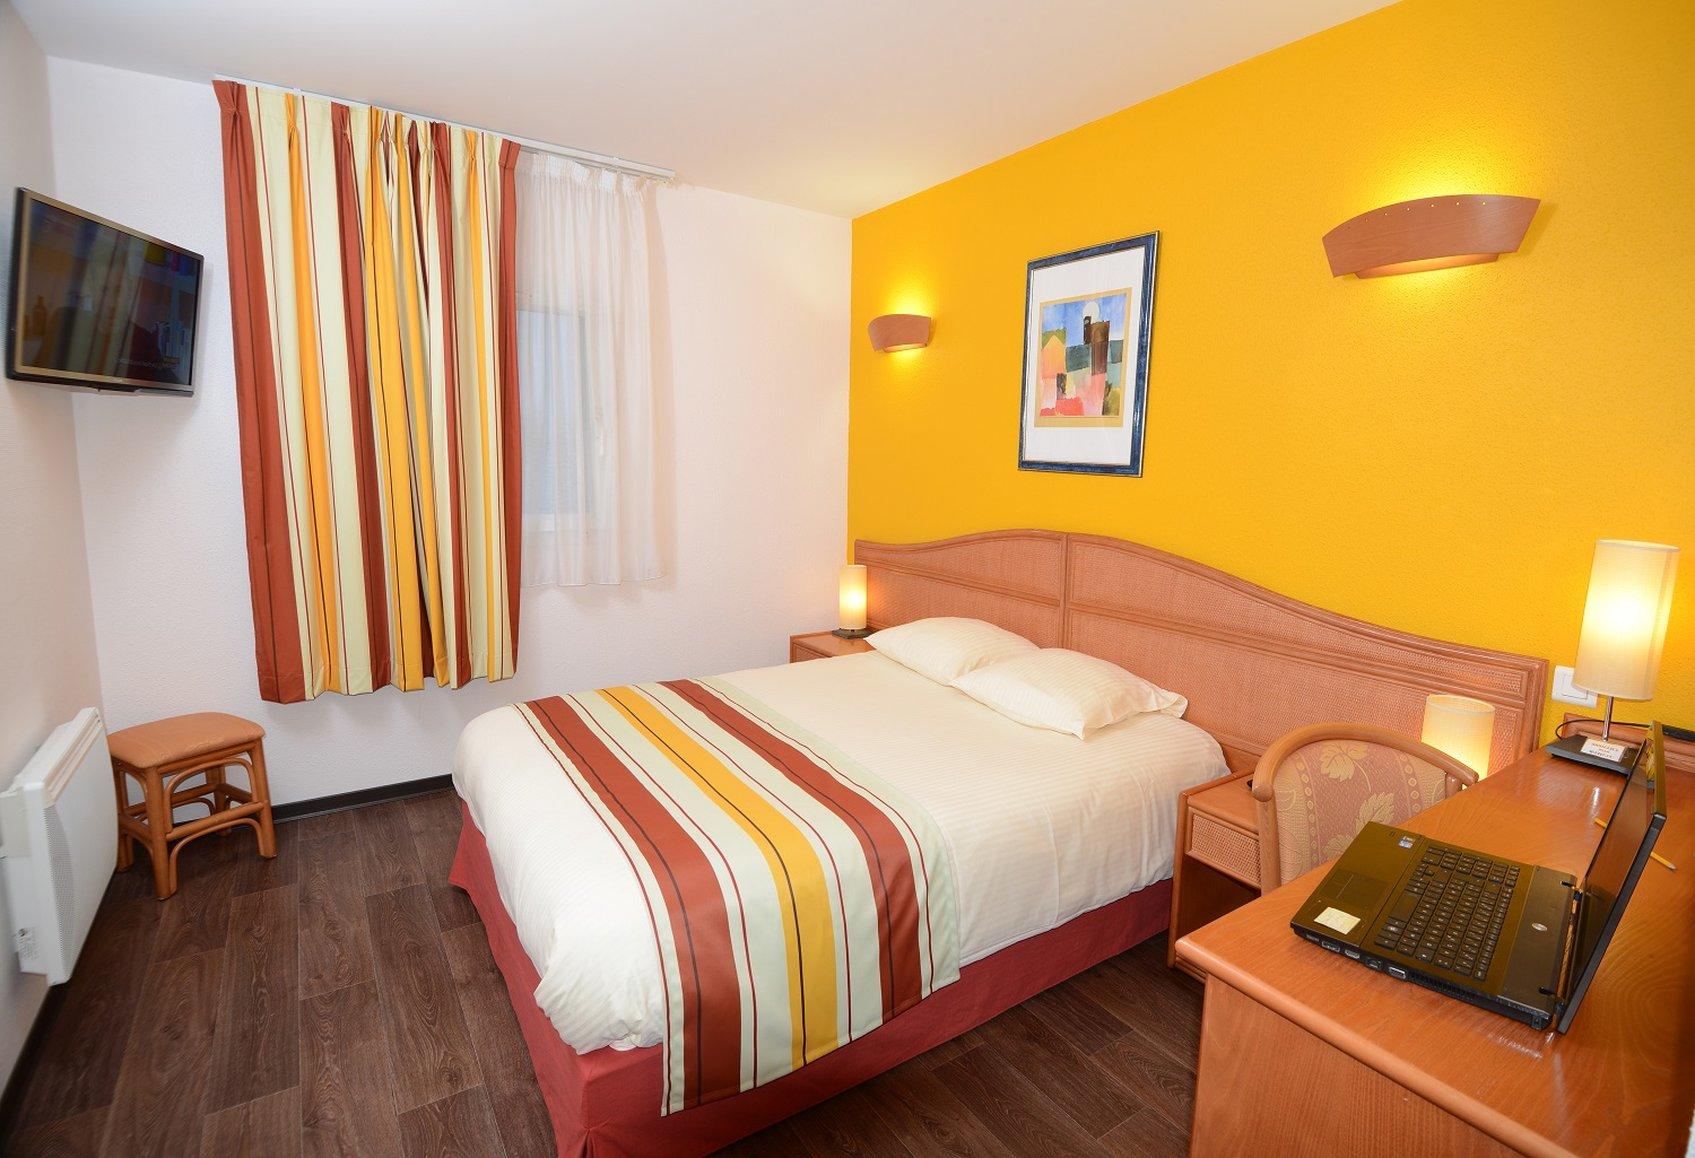 Hotel Roi Soleil Amneville Les Thermes